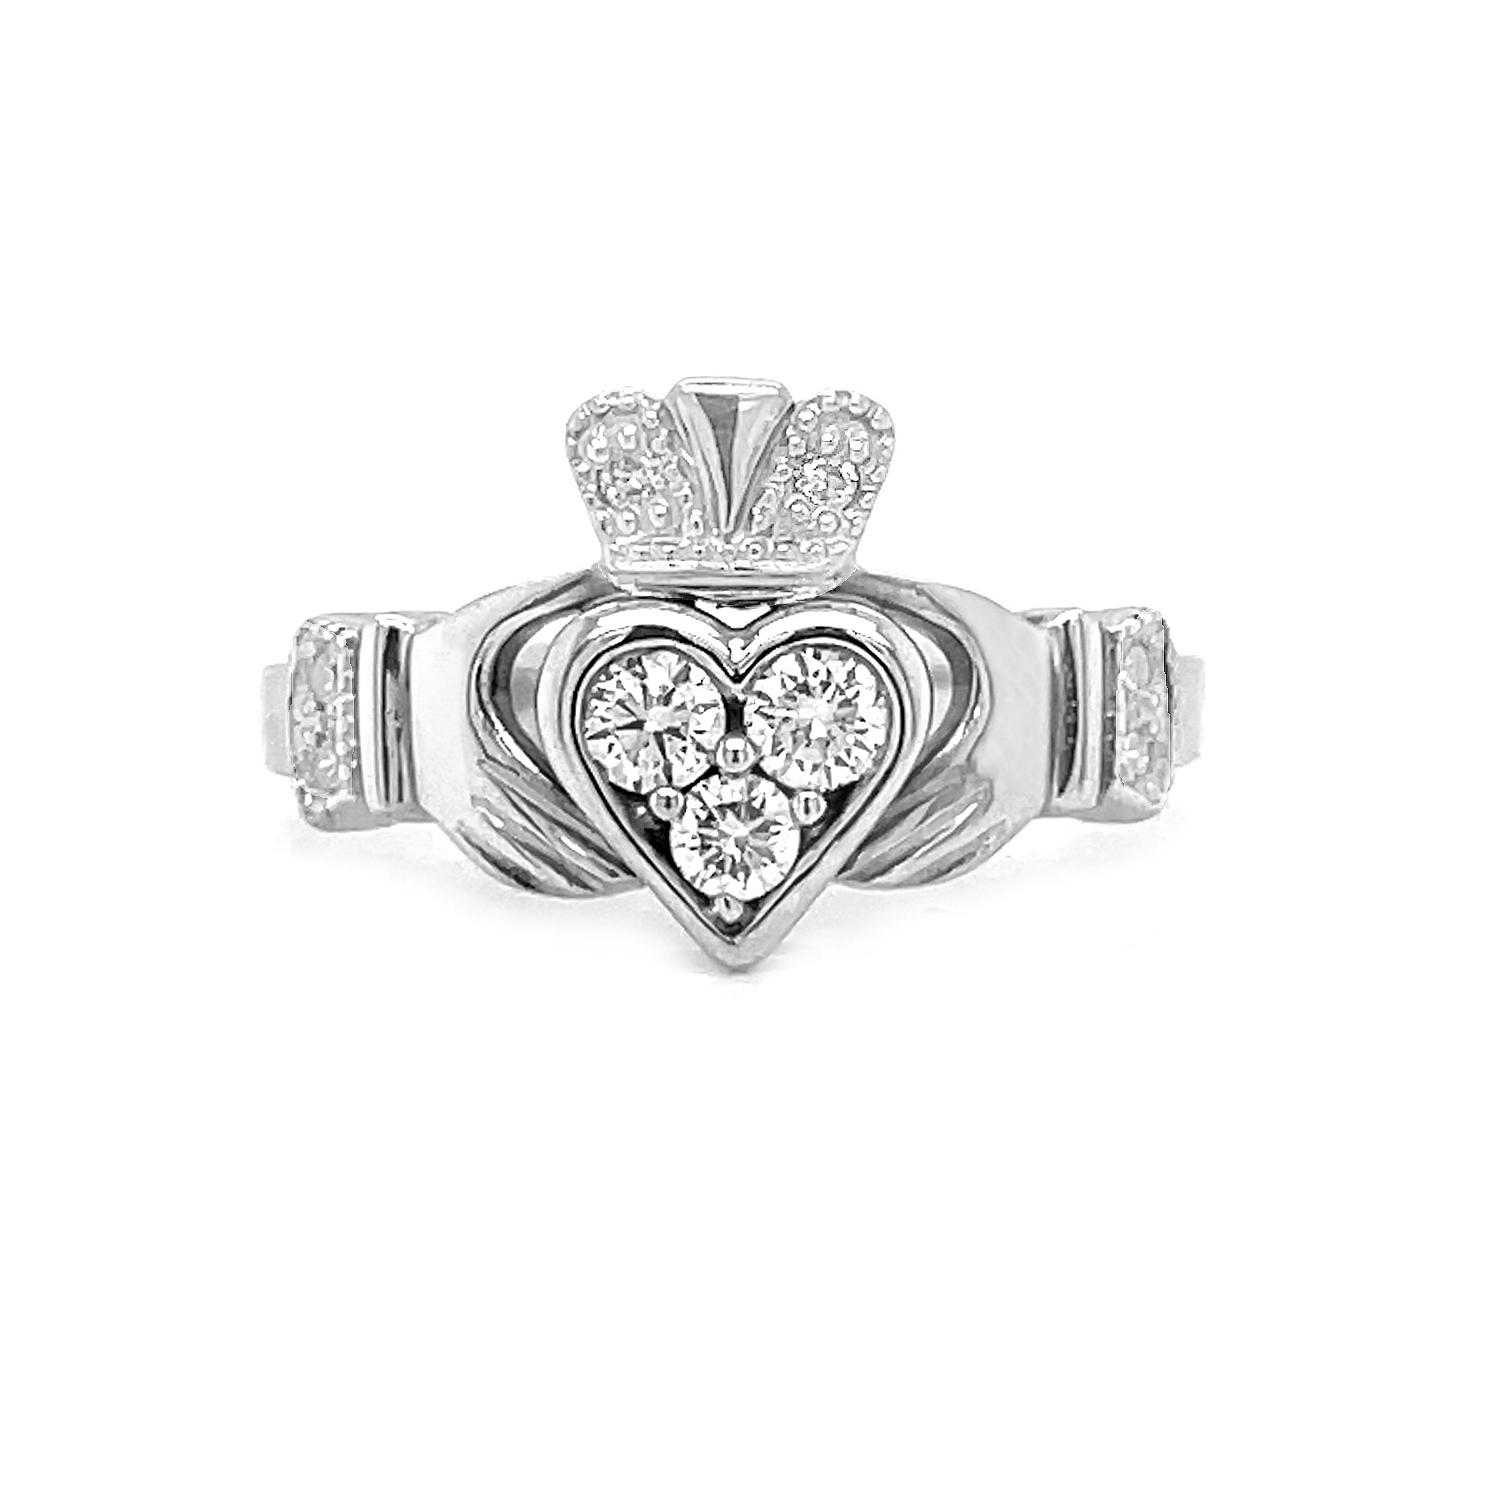 White Gold 3 Stone Diamond Claddagh Ring, CL402P